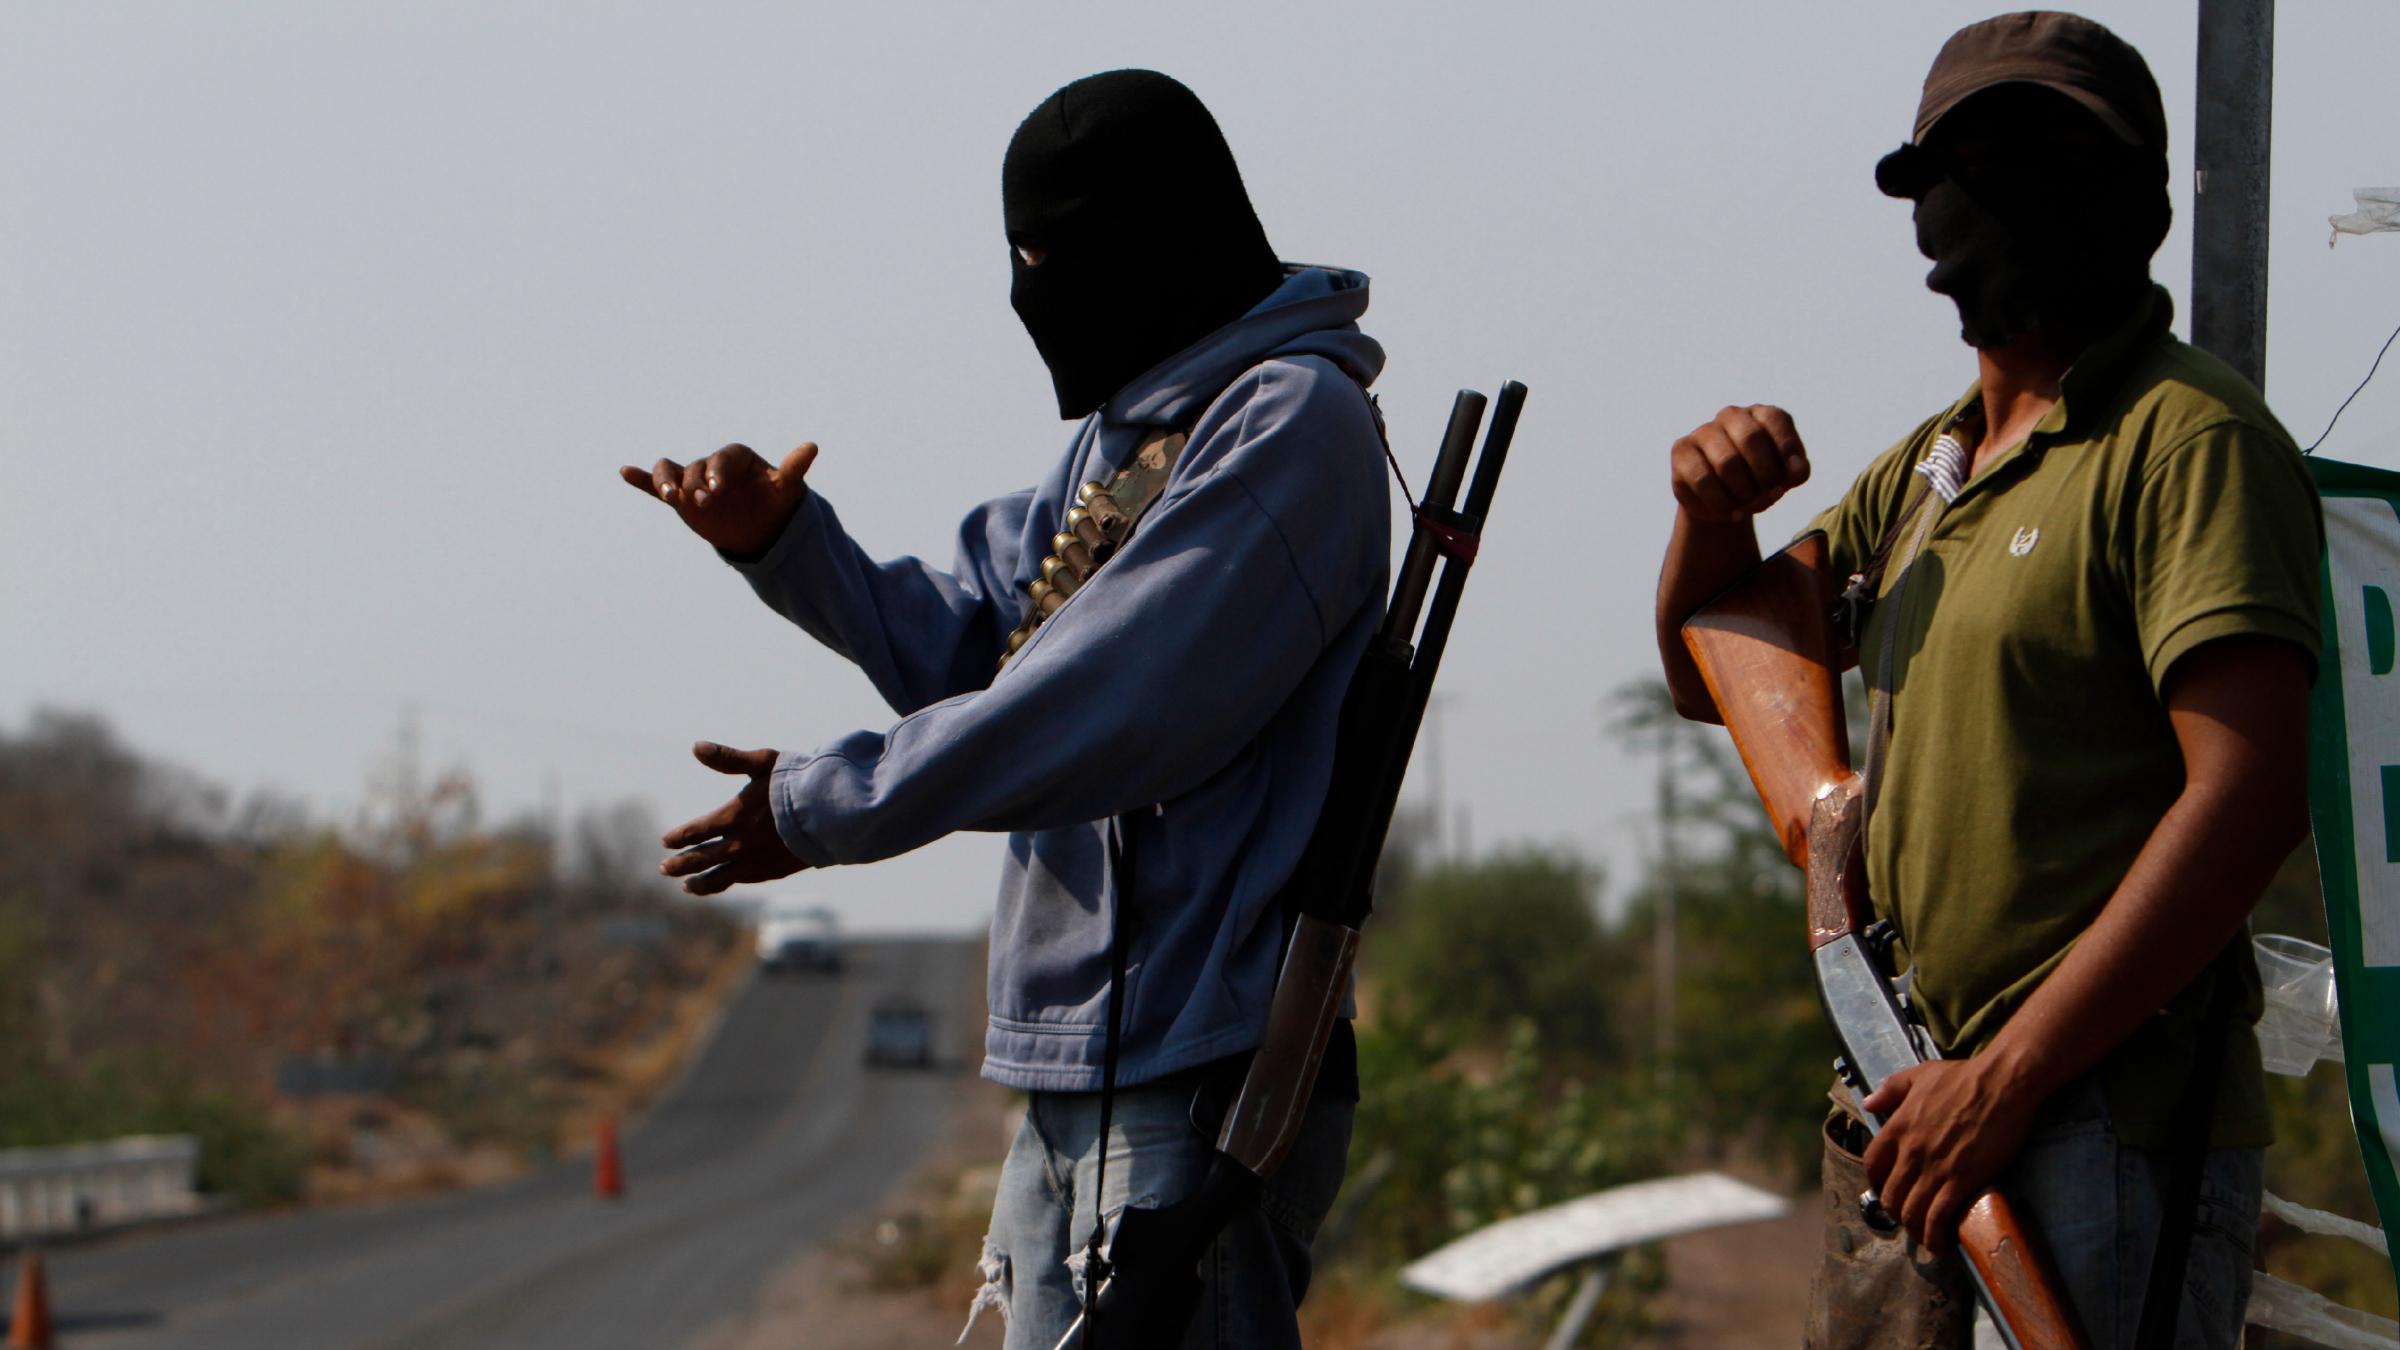 Masked and armed drug cartel members.